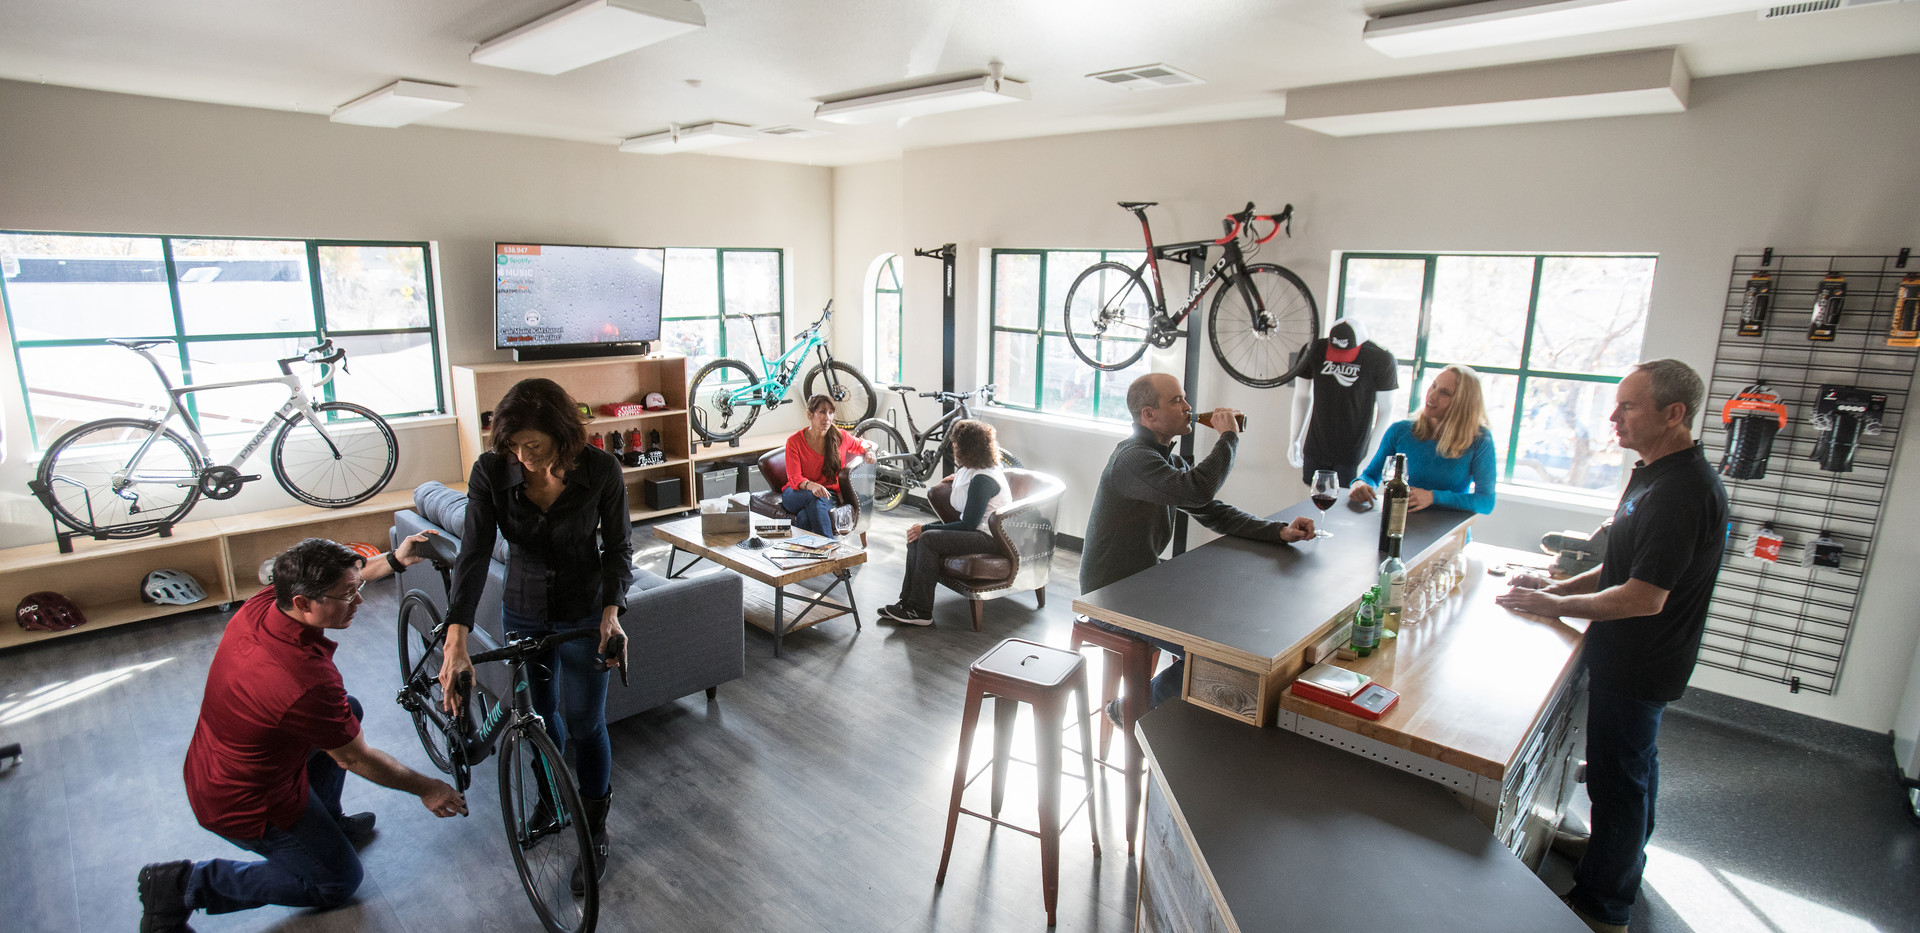 Zealot Bike Shop, Beer and Wine Bar